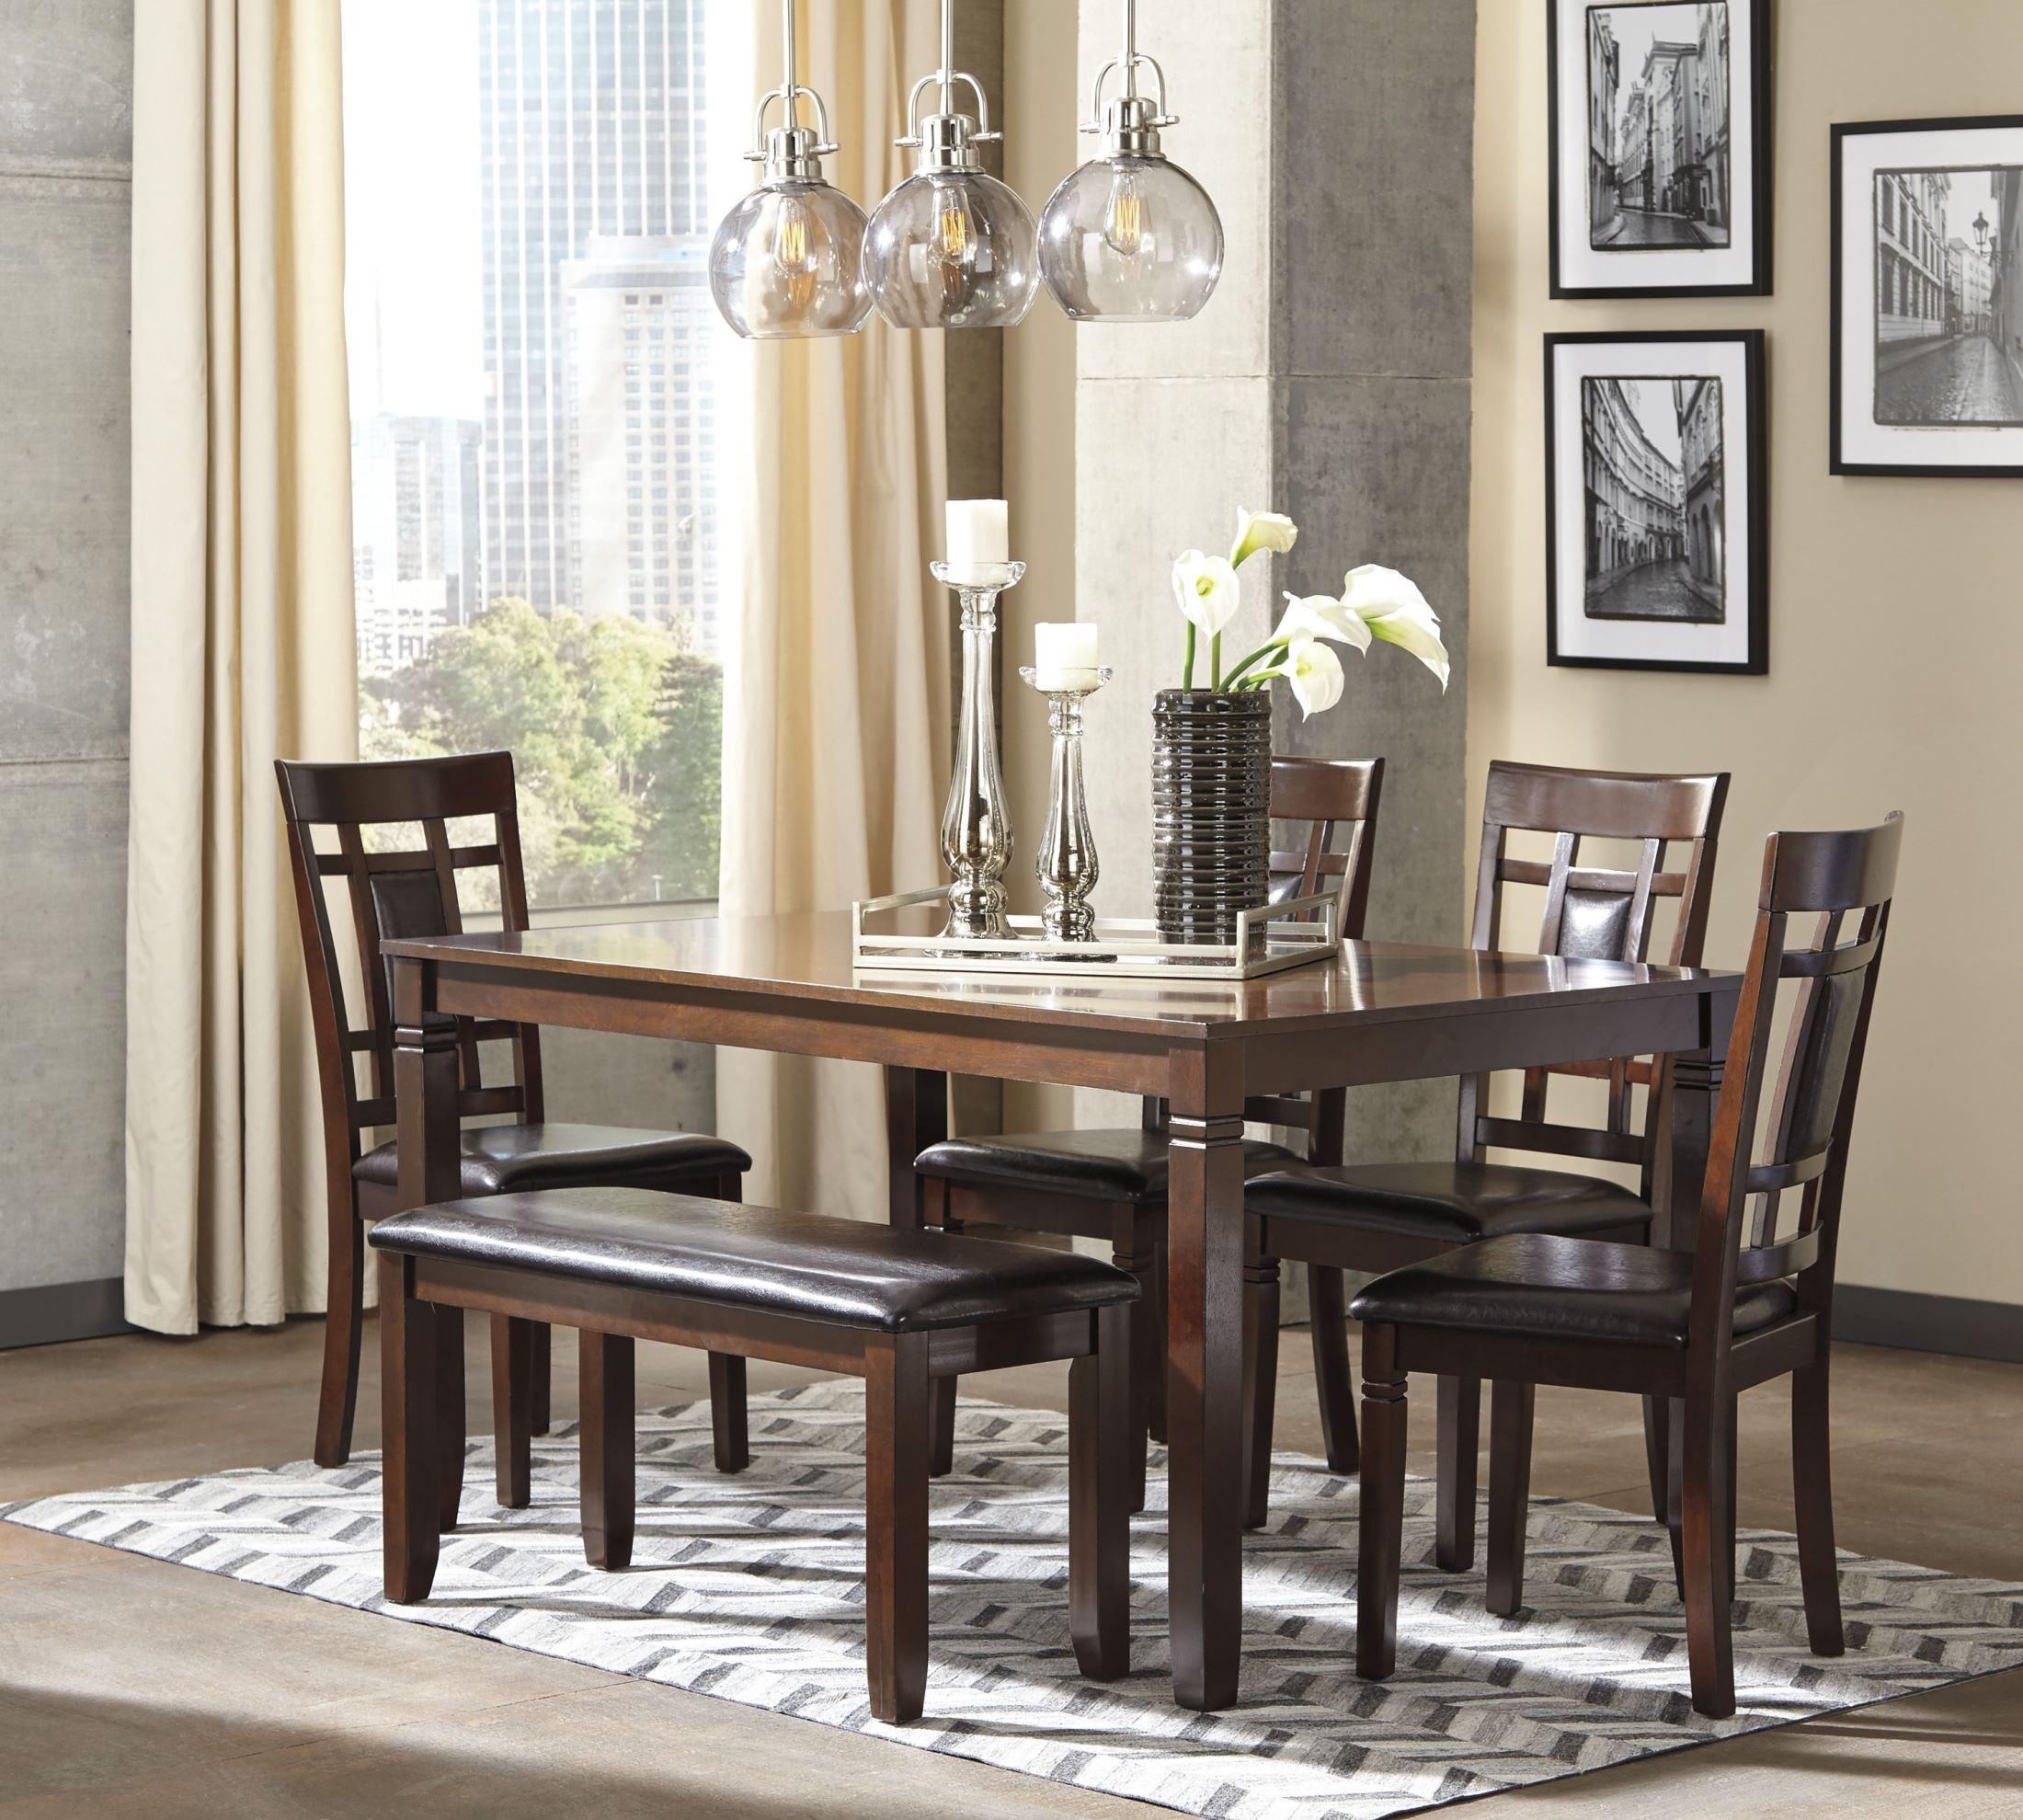 Bennox Brown 6 Piece Rectangular Dining Room